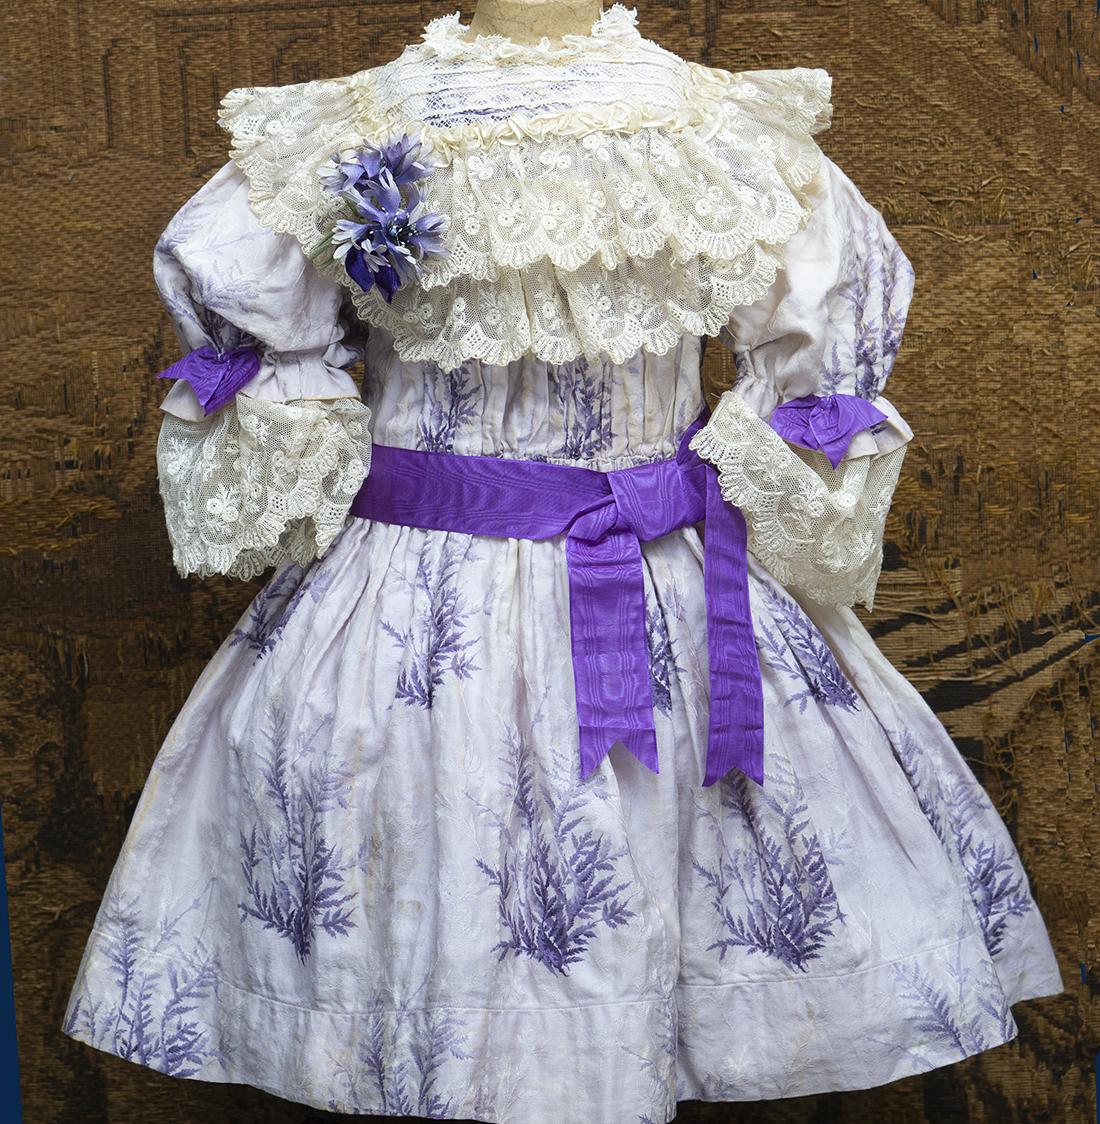 Antique Original dress for doll 26in